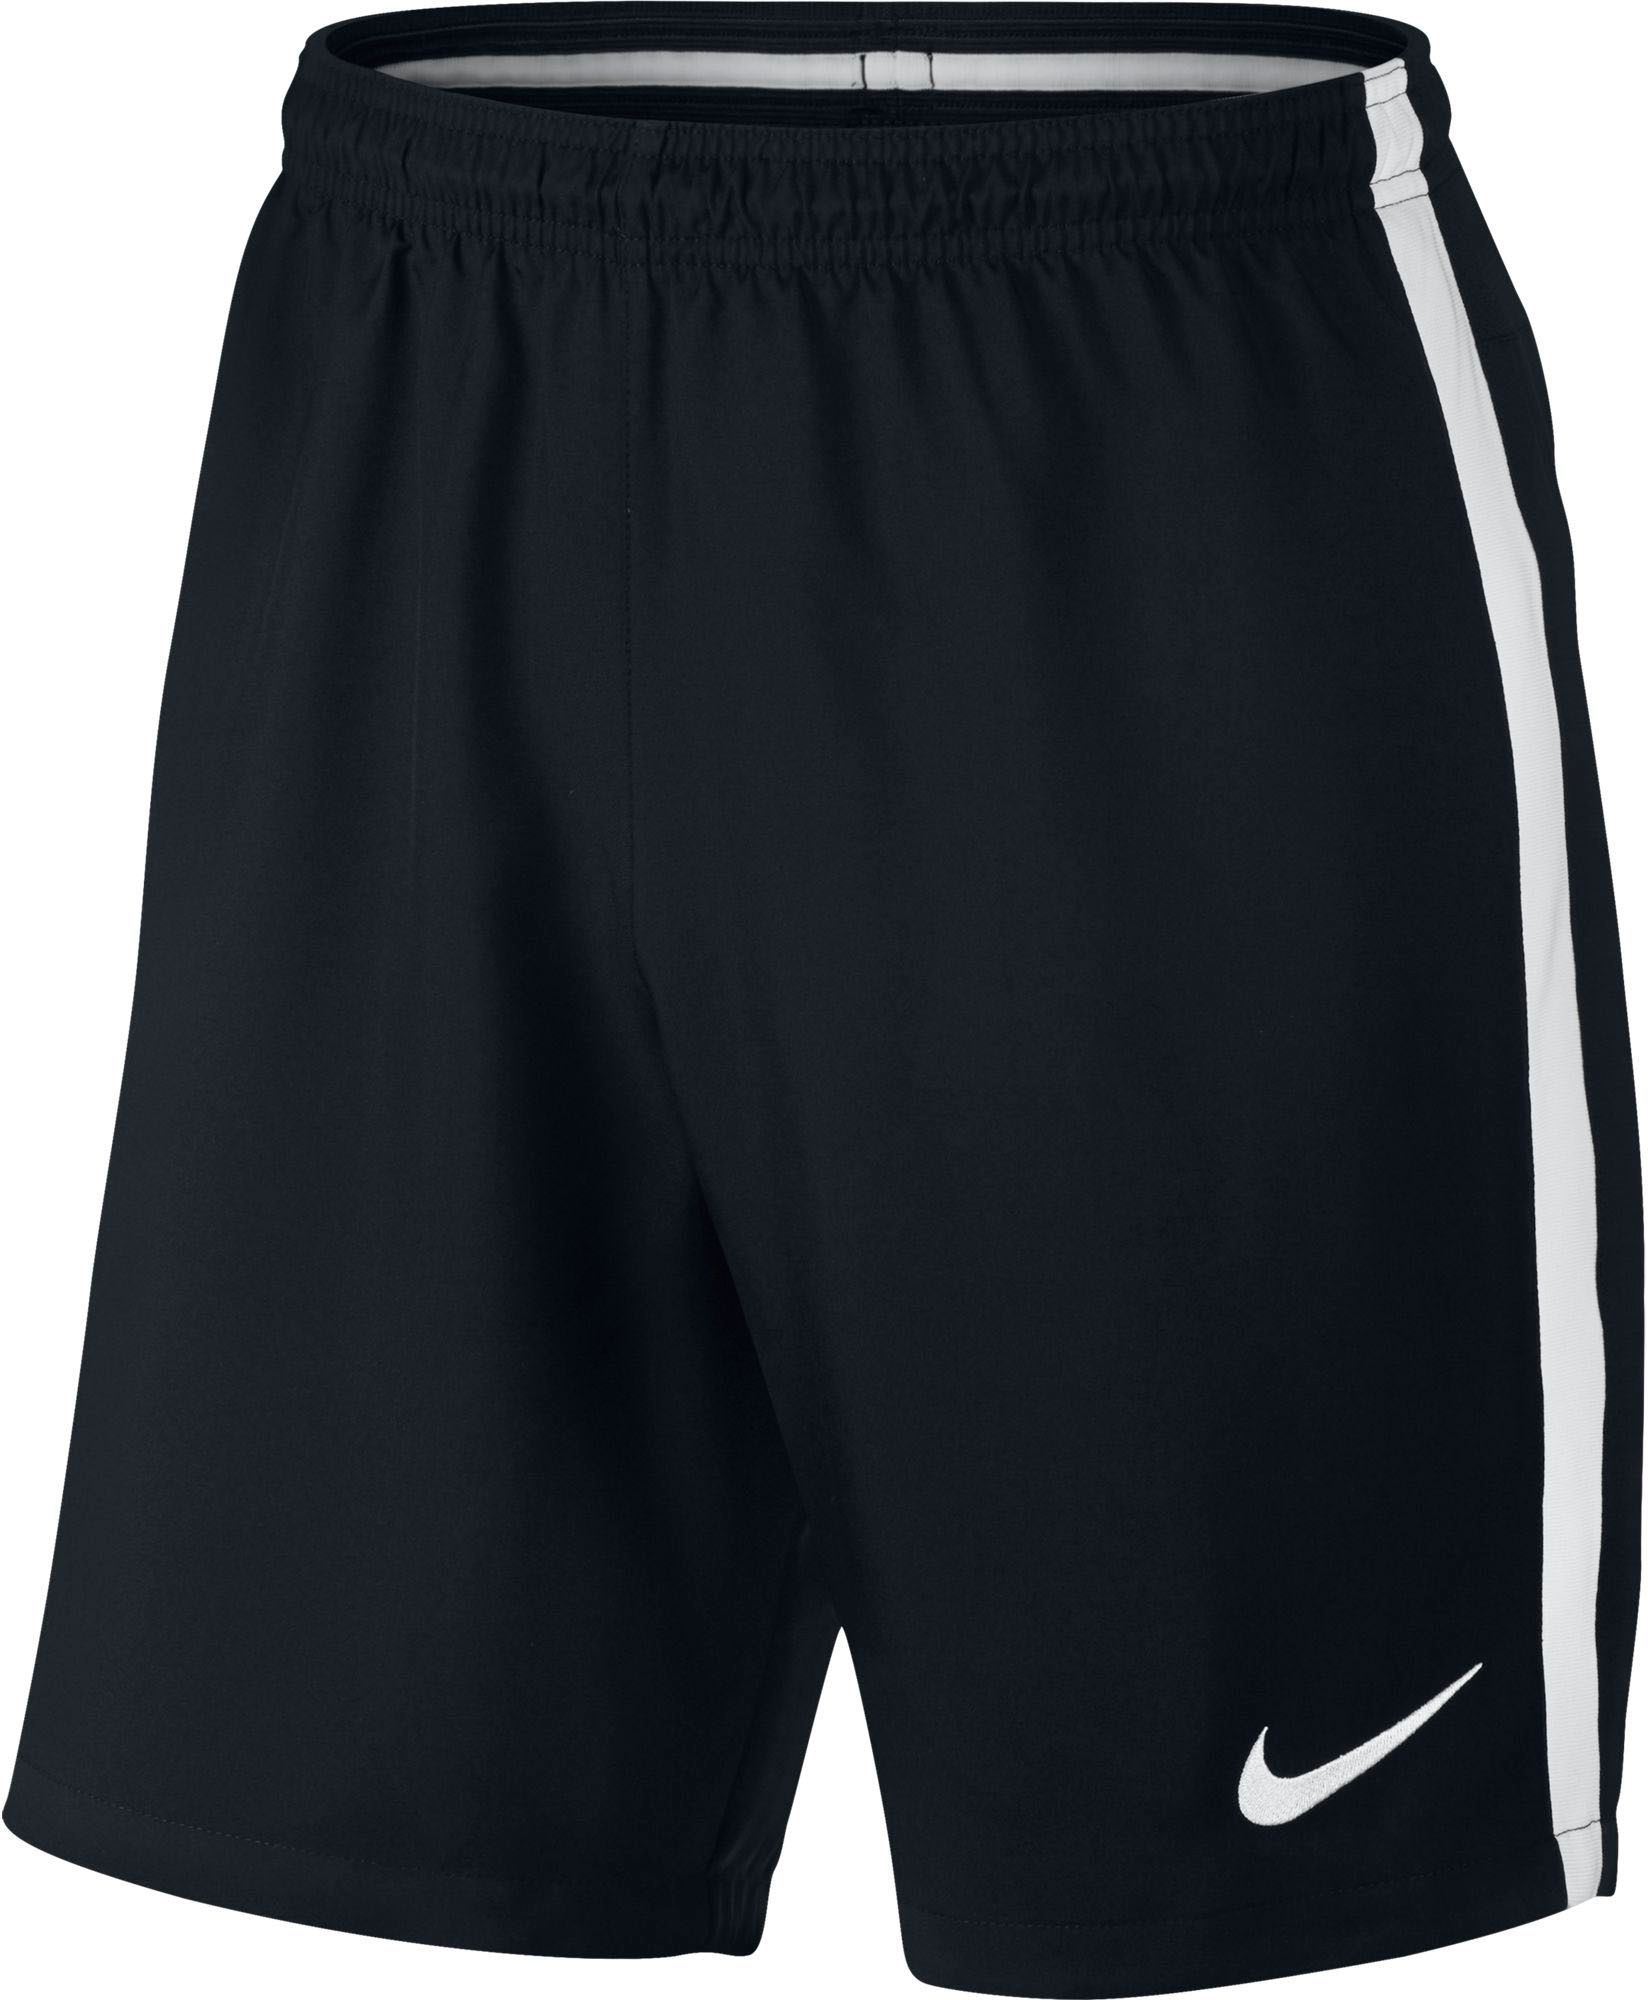 Womens Nike Academy19 Pocketed Shorts – Black